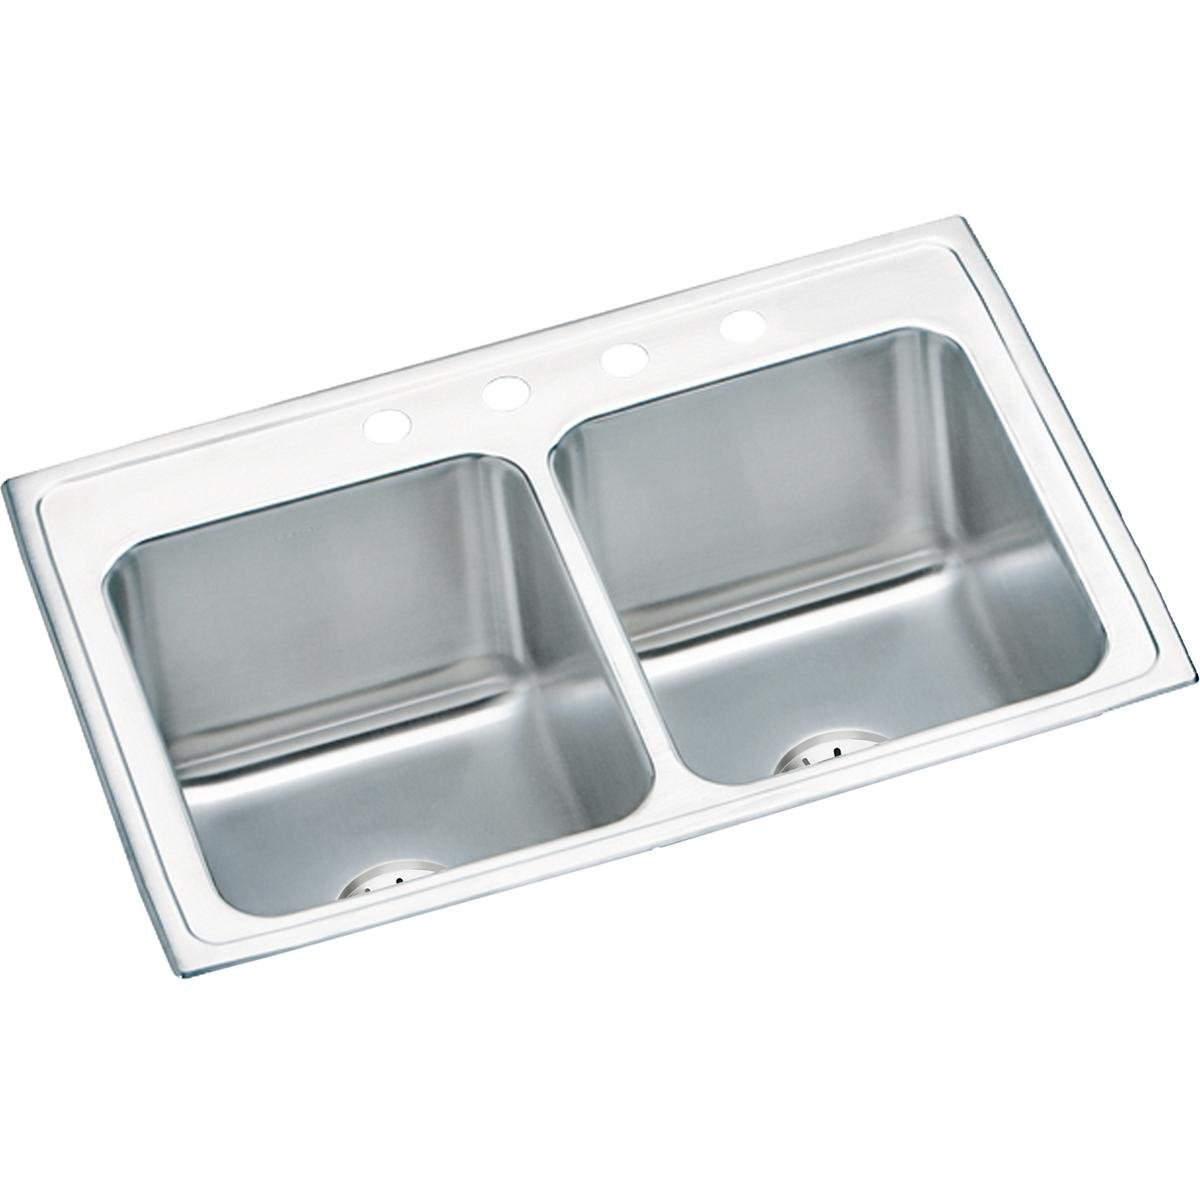 Elkay DLR332210PDMR2 18 Gauge Stainless Steel 33 x 22 x 10.125 Double Bowl Top Mount Kitchen Sink Kit